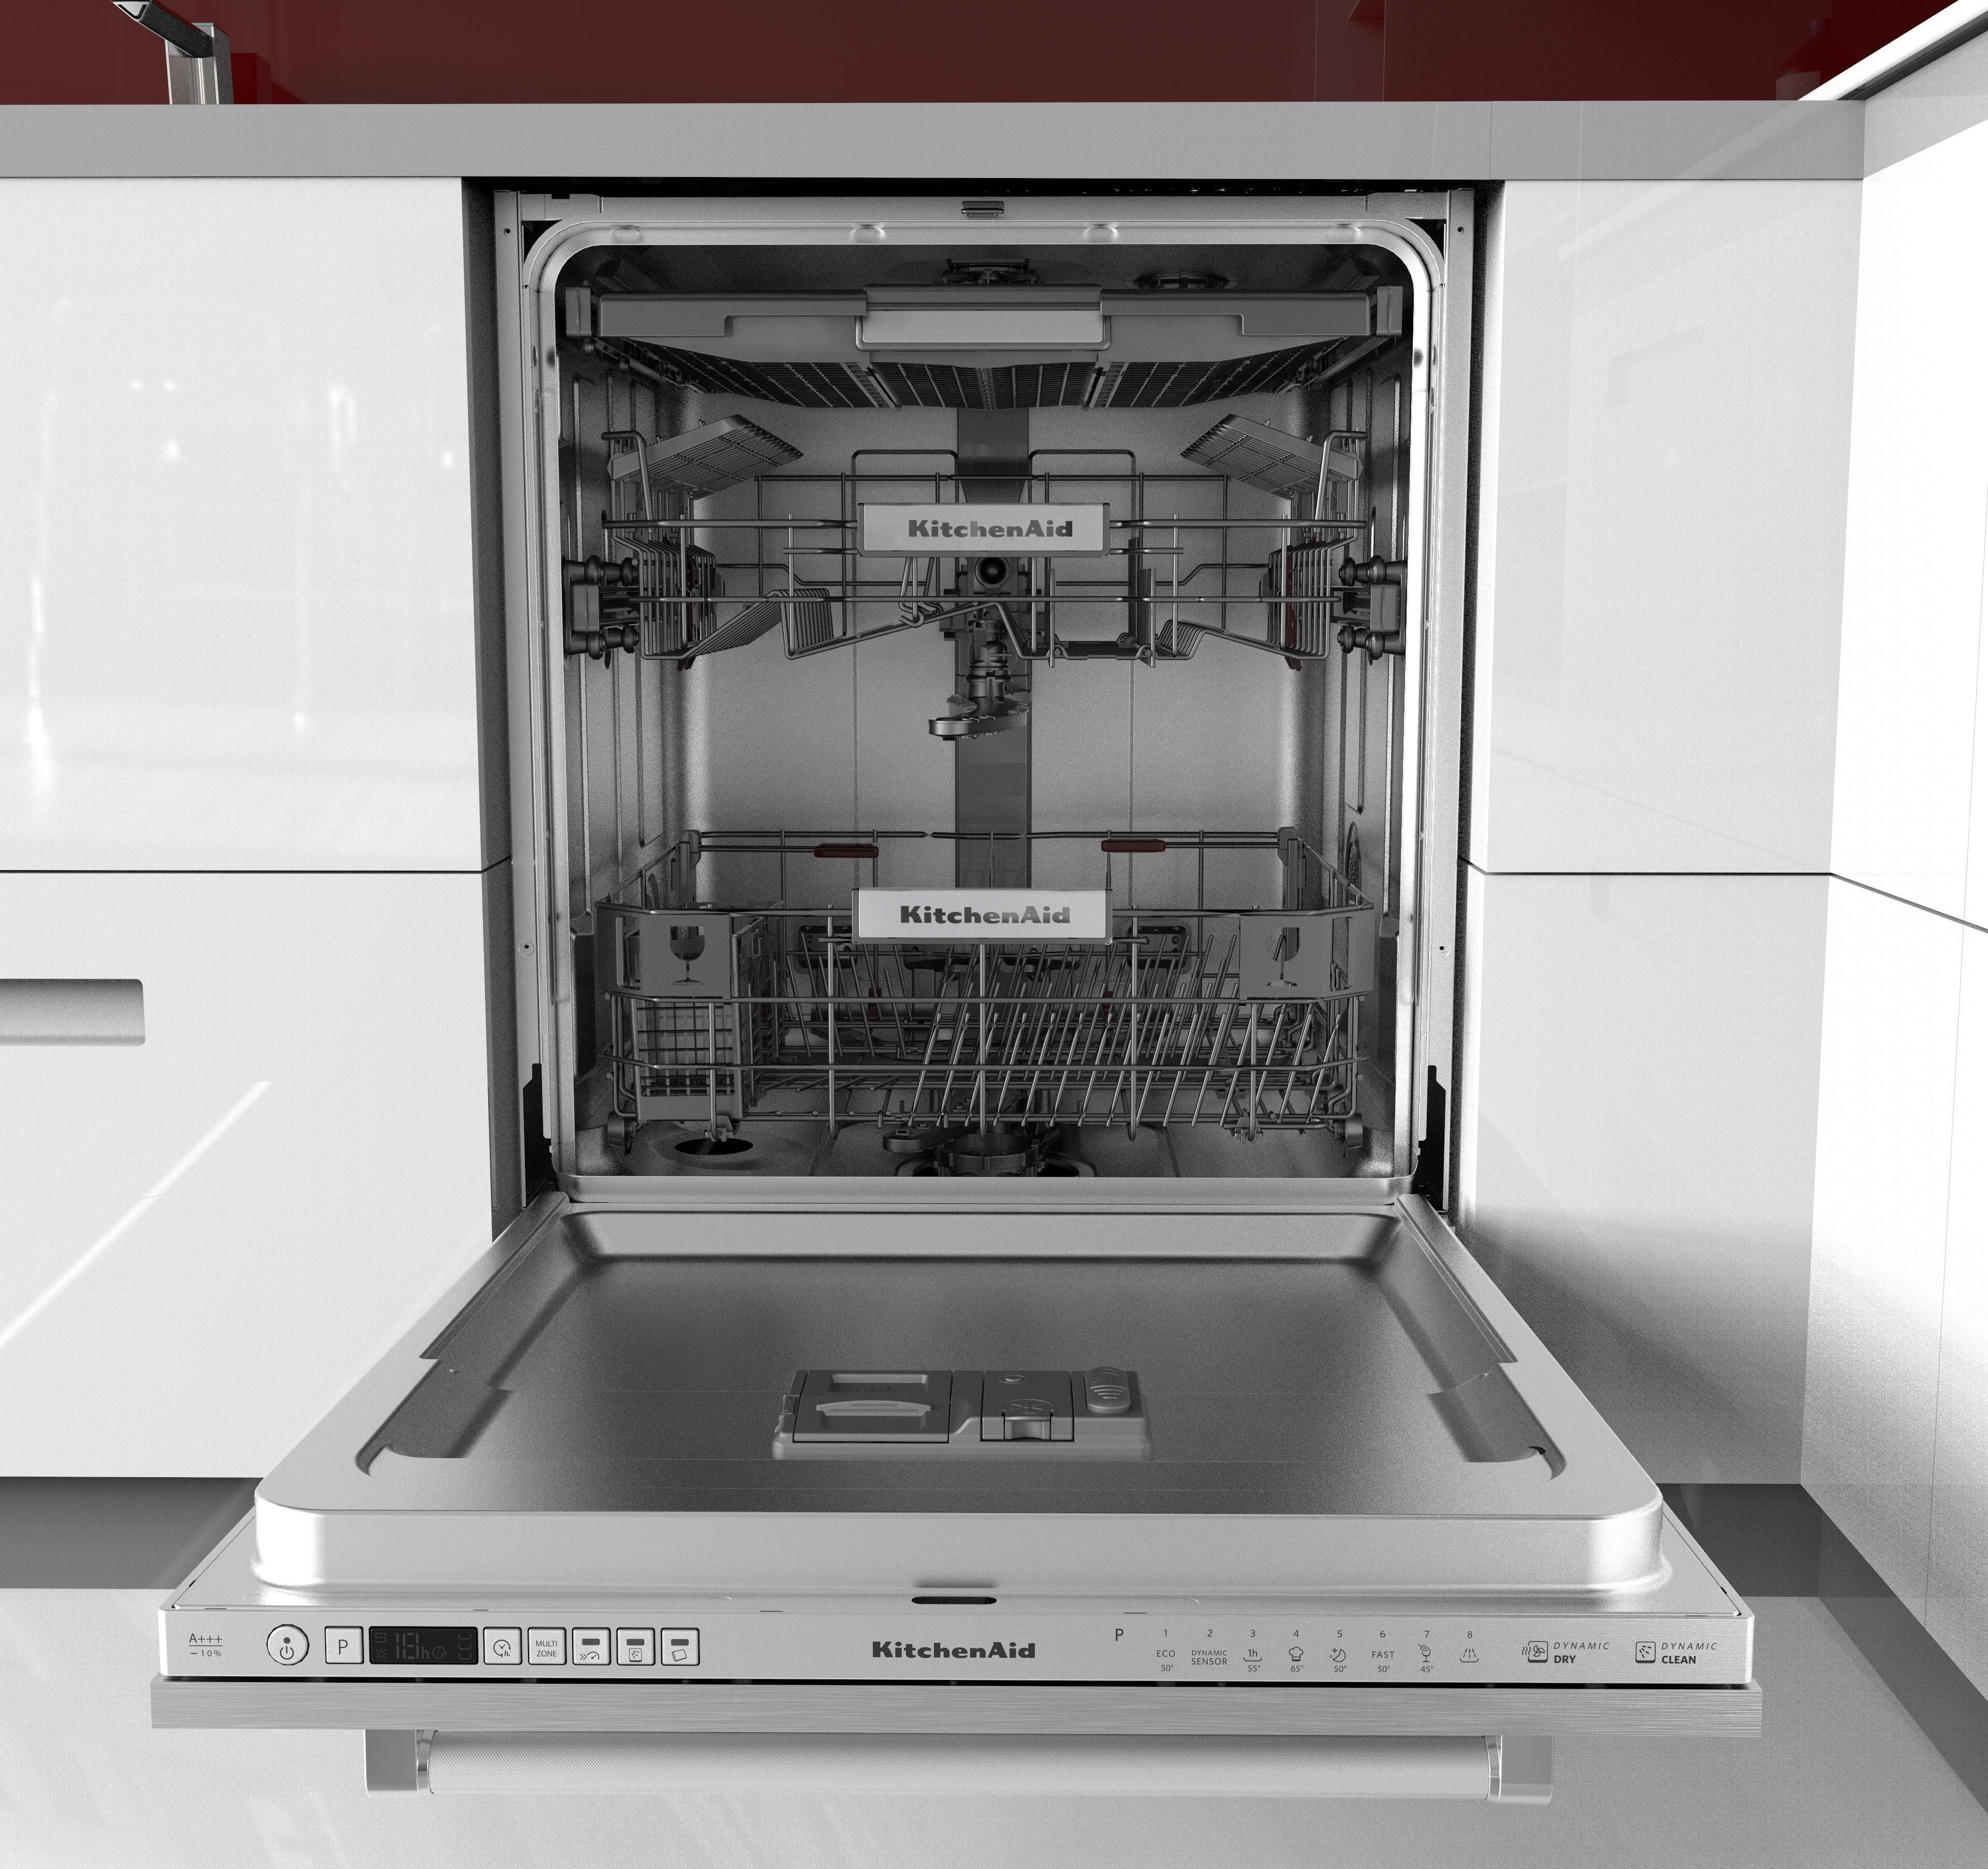 KitchenAid vollintegrierbarer Geschirrspüler, KDSCM 82141, 9 l, 14 Maßgedecke